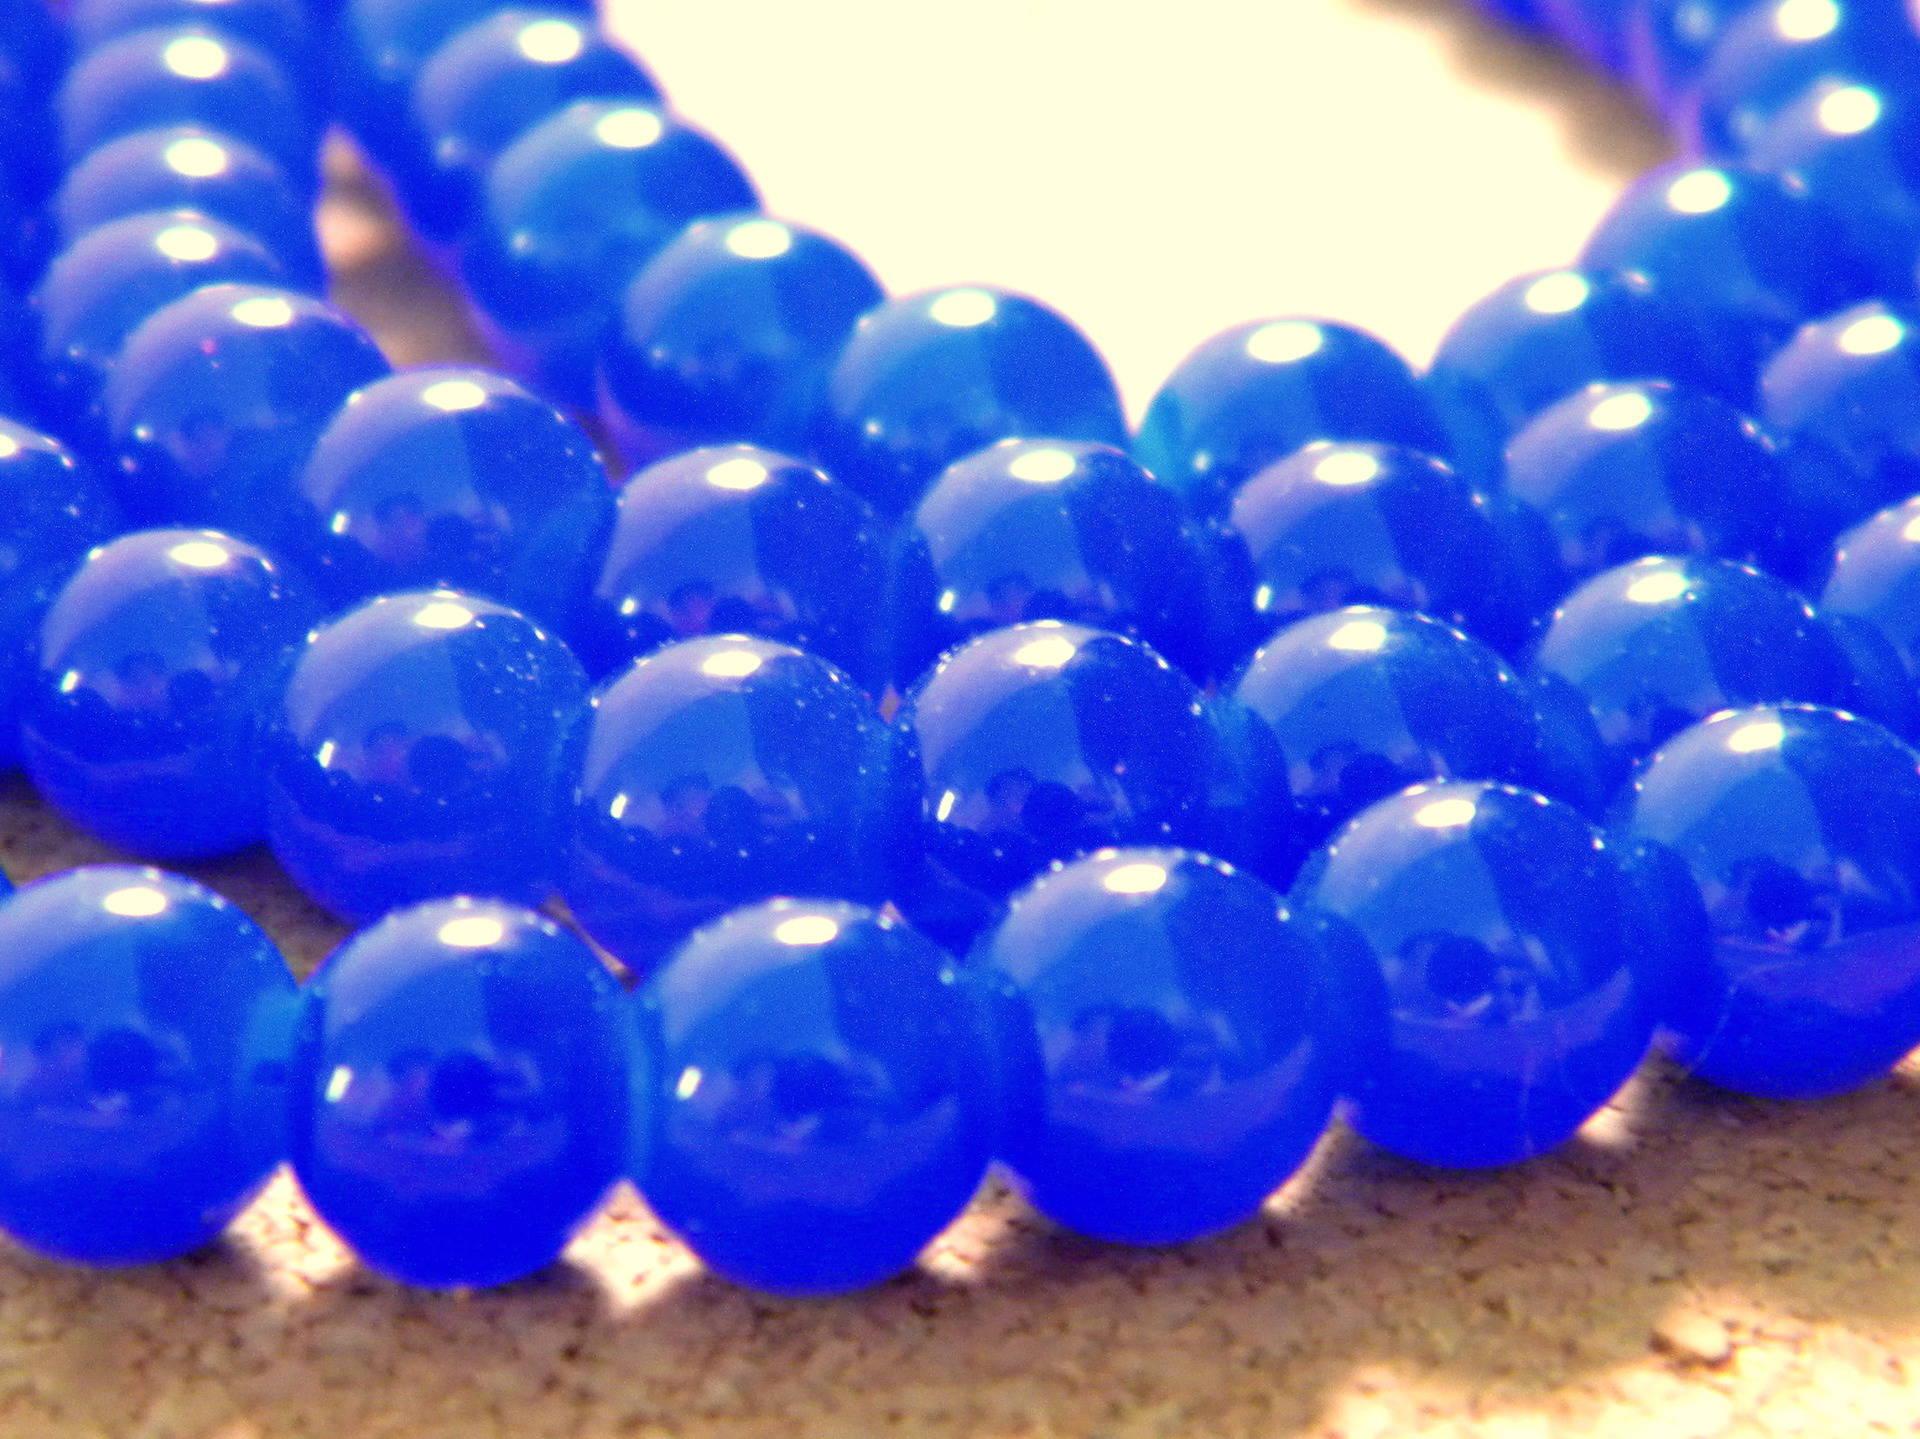 8 mm divers couleurs 50 x imitation jade perles de verre-rond-Craquelé